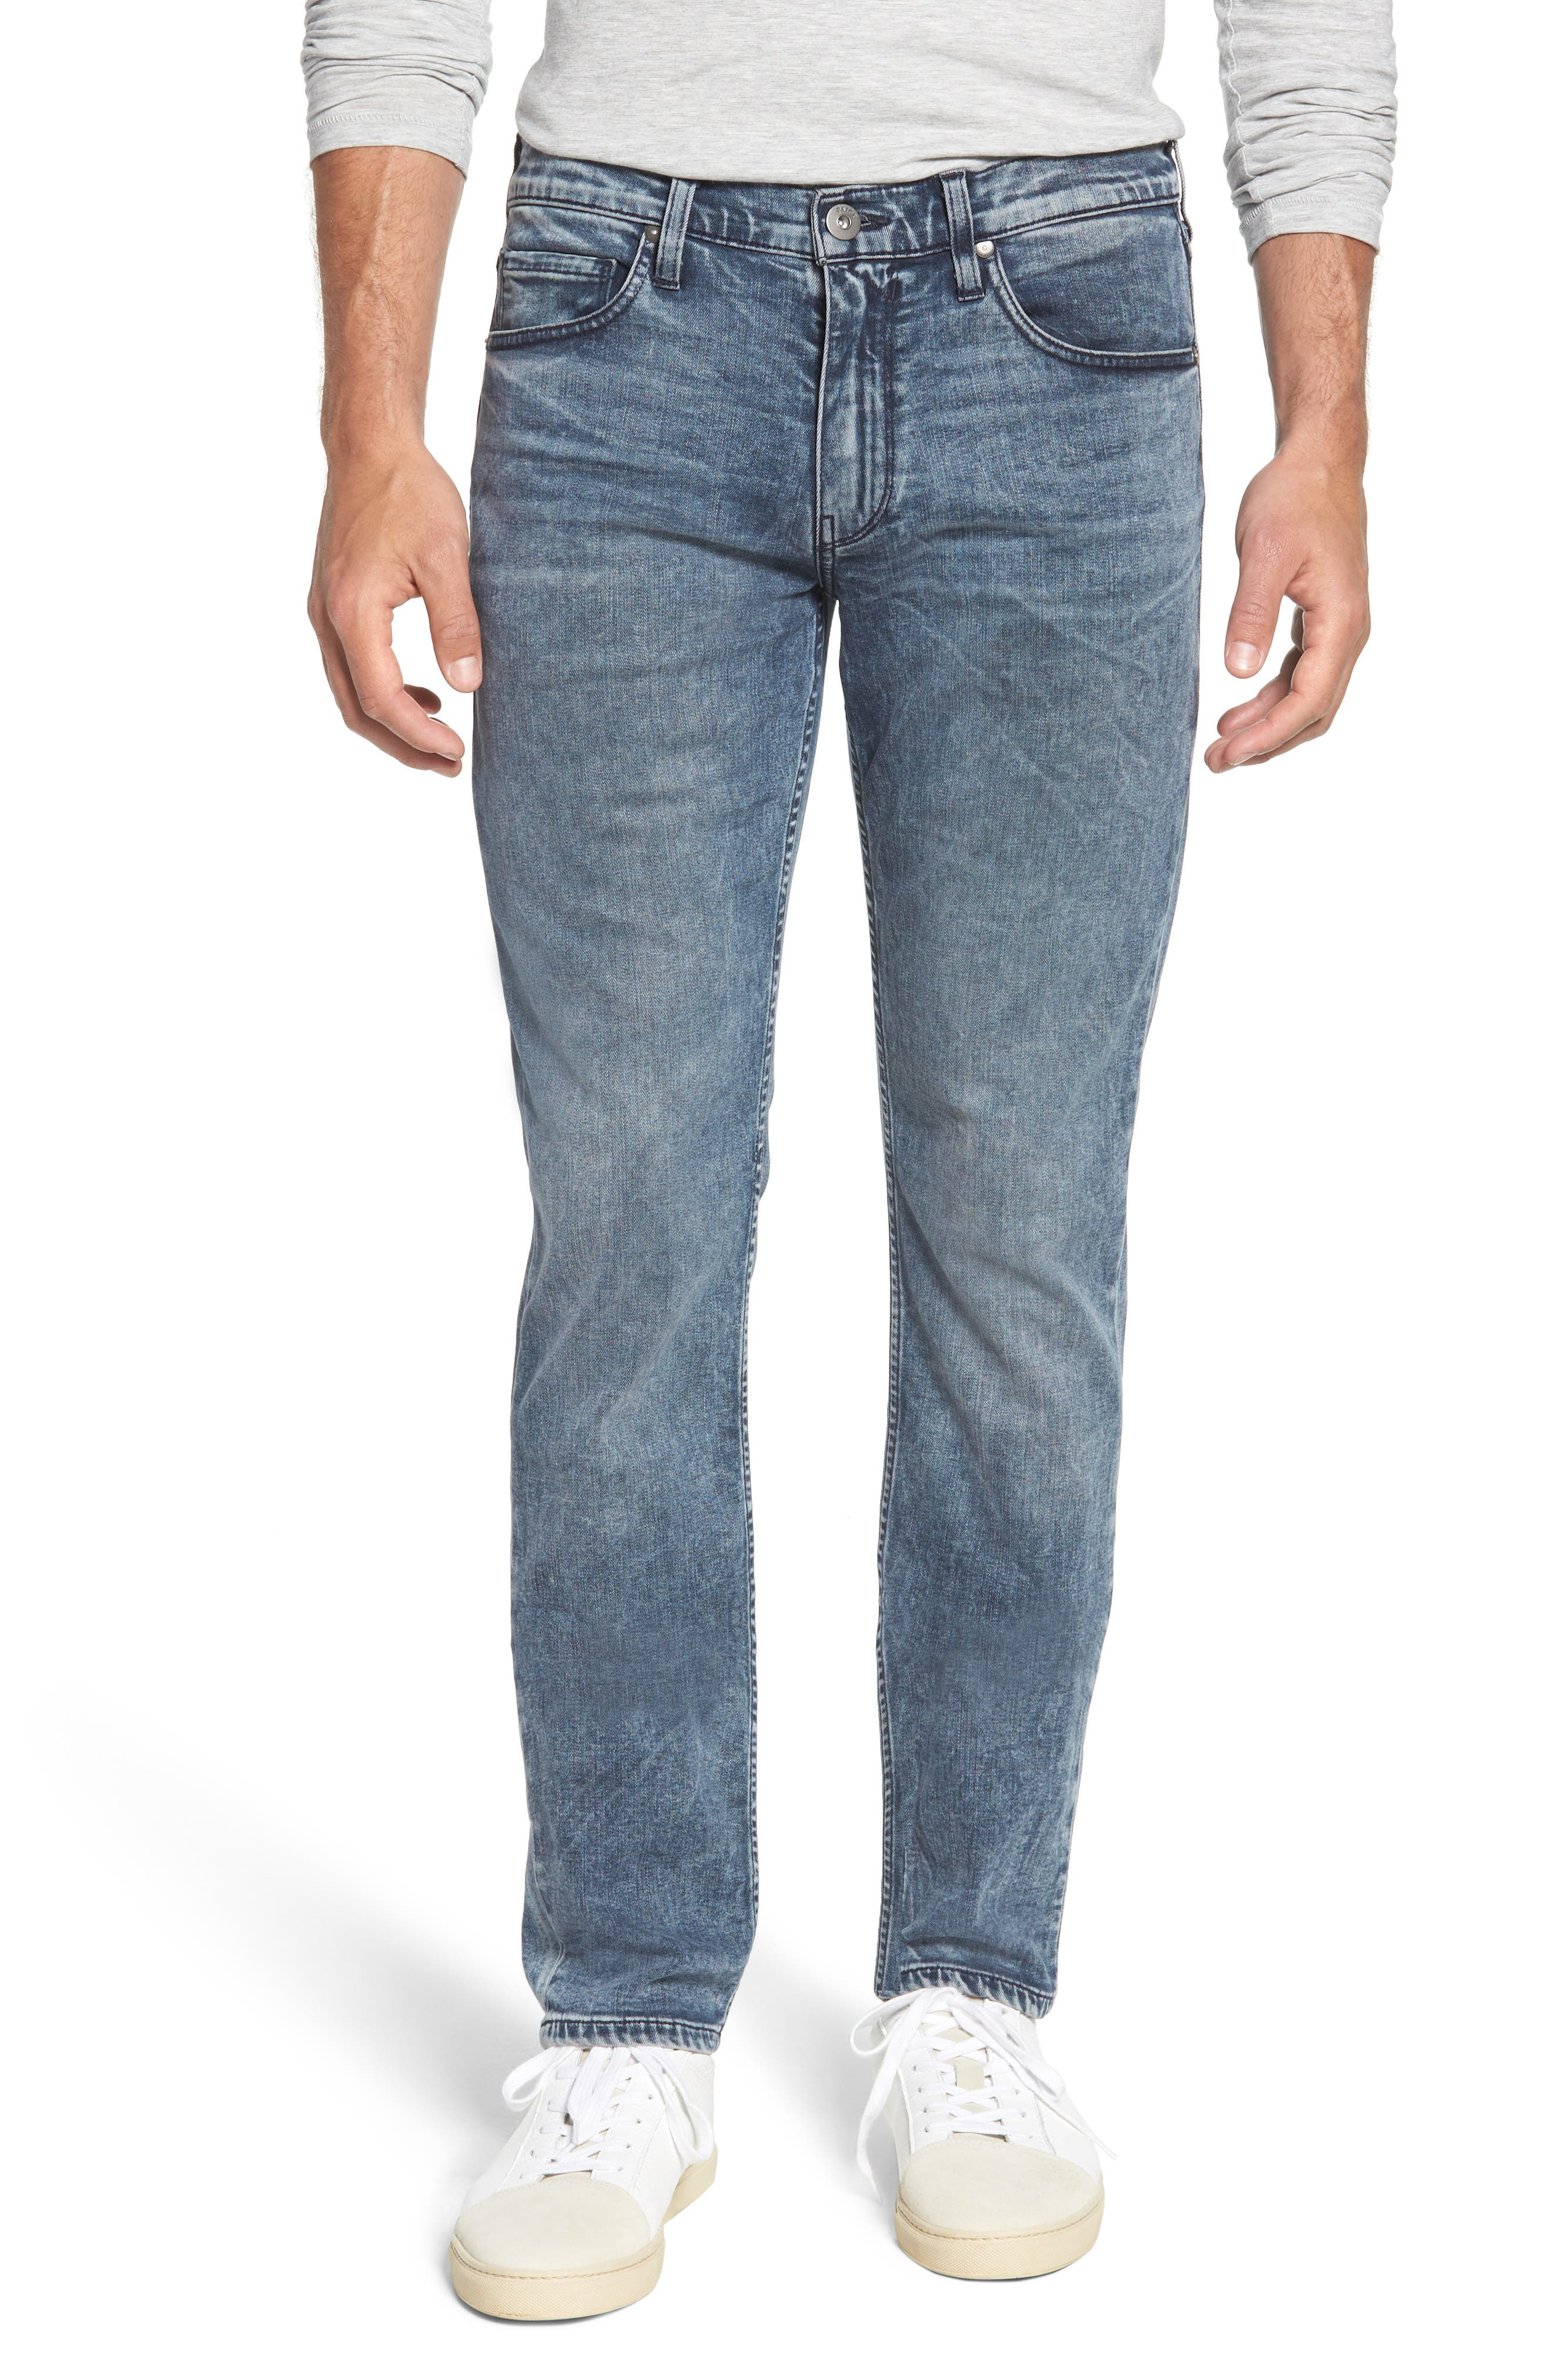 Transcend - Lennox Slim Fit Jeans,                             Main thumbnail 1, color,                             Higgs